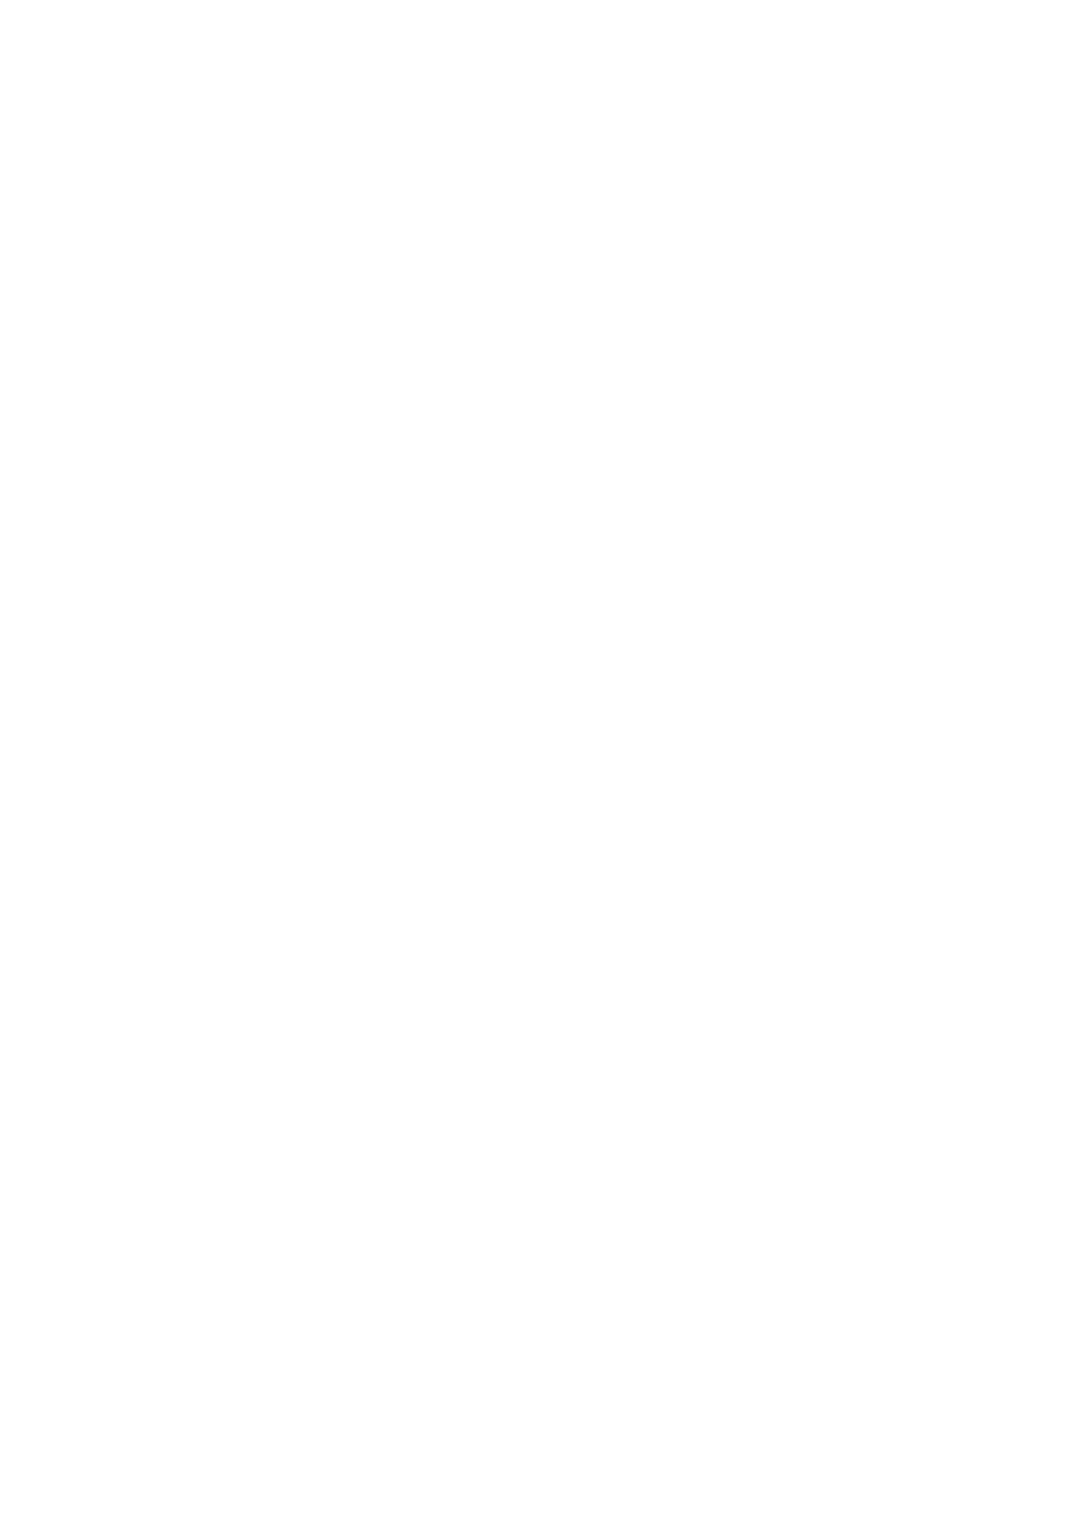 [Macxe's (monmon)] Tokubousentai Dinaranger ~Heroine Kairaku Sennou Keikaku~ Vol.01/02/03 (Renkaban) [Digital] 2